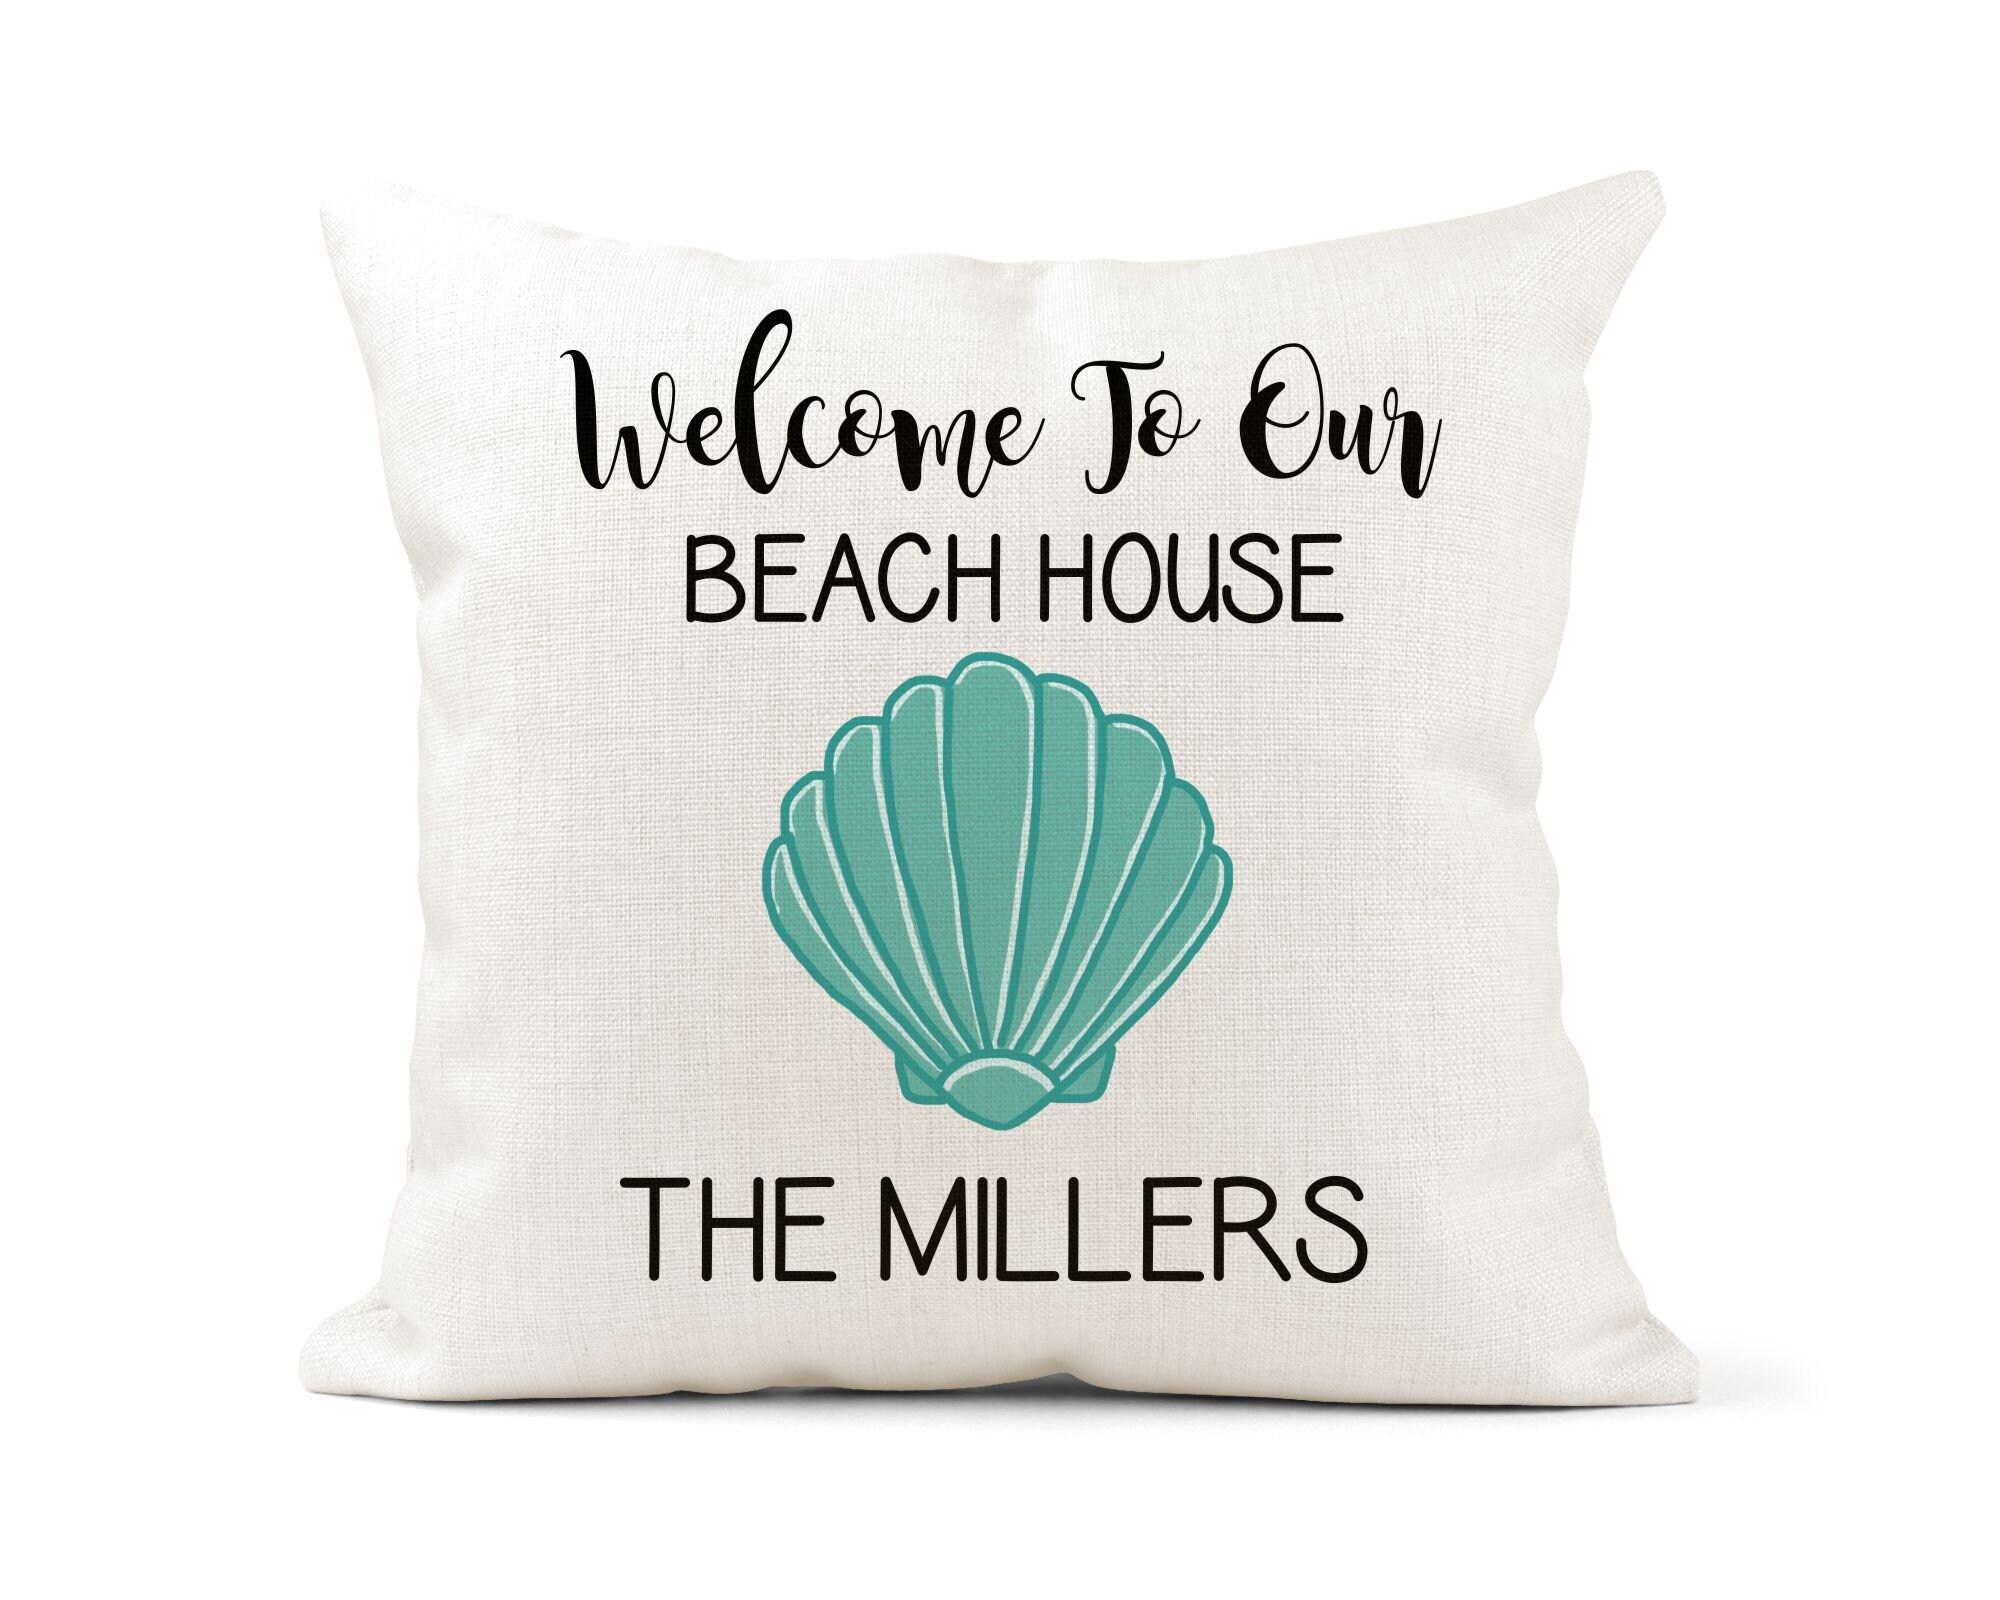 Personalized Beach House Pillow Beach House Decor